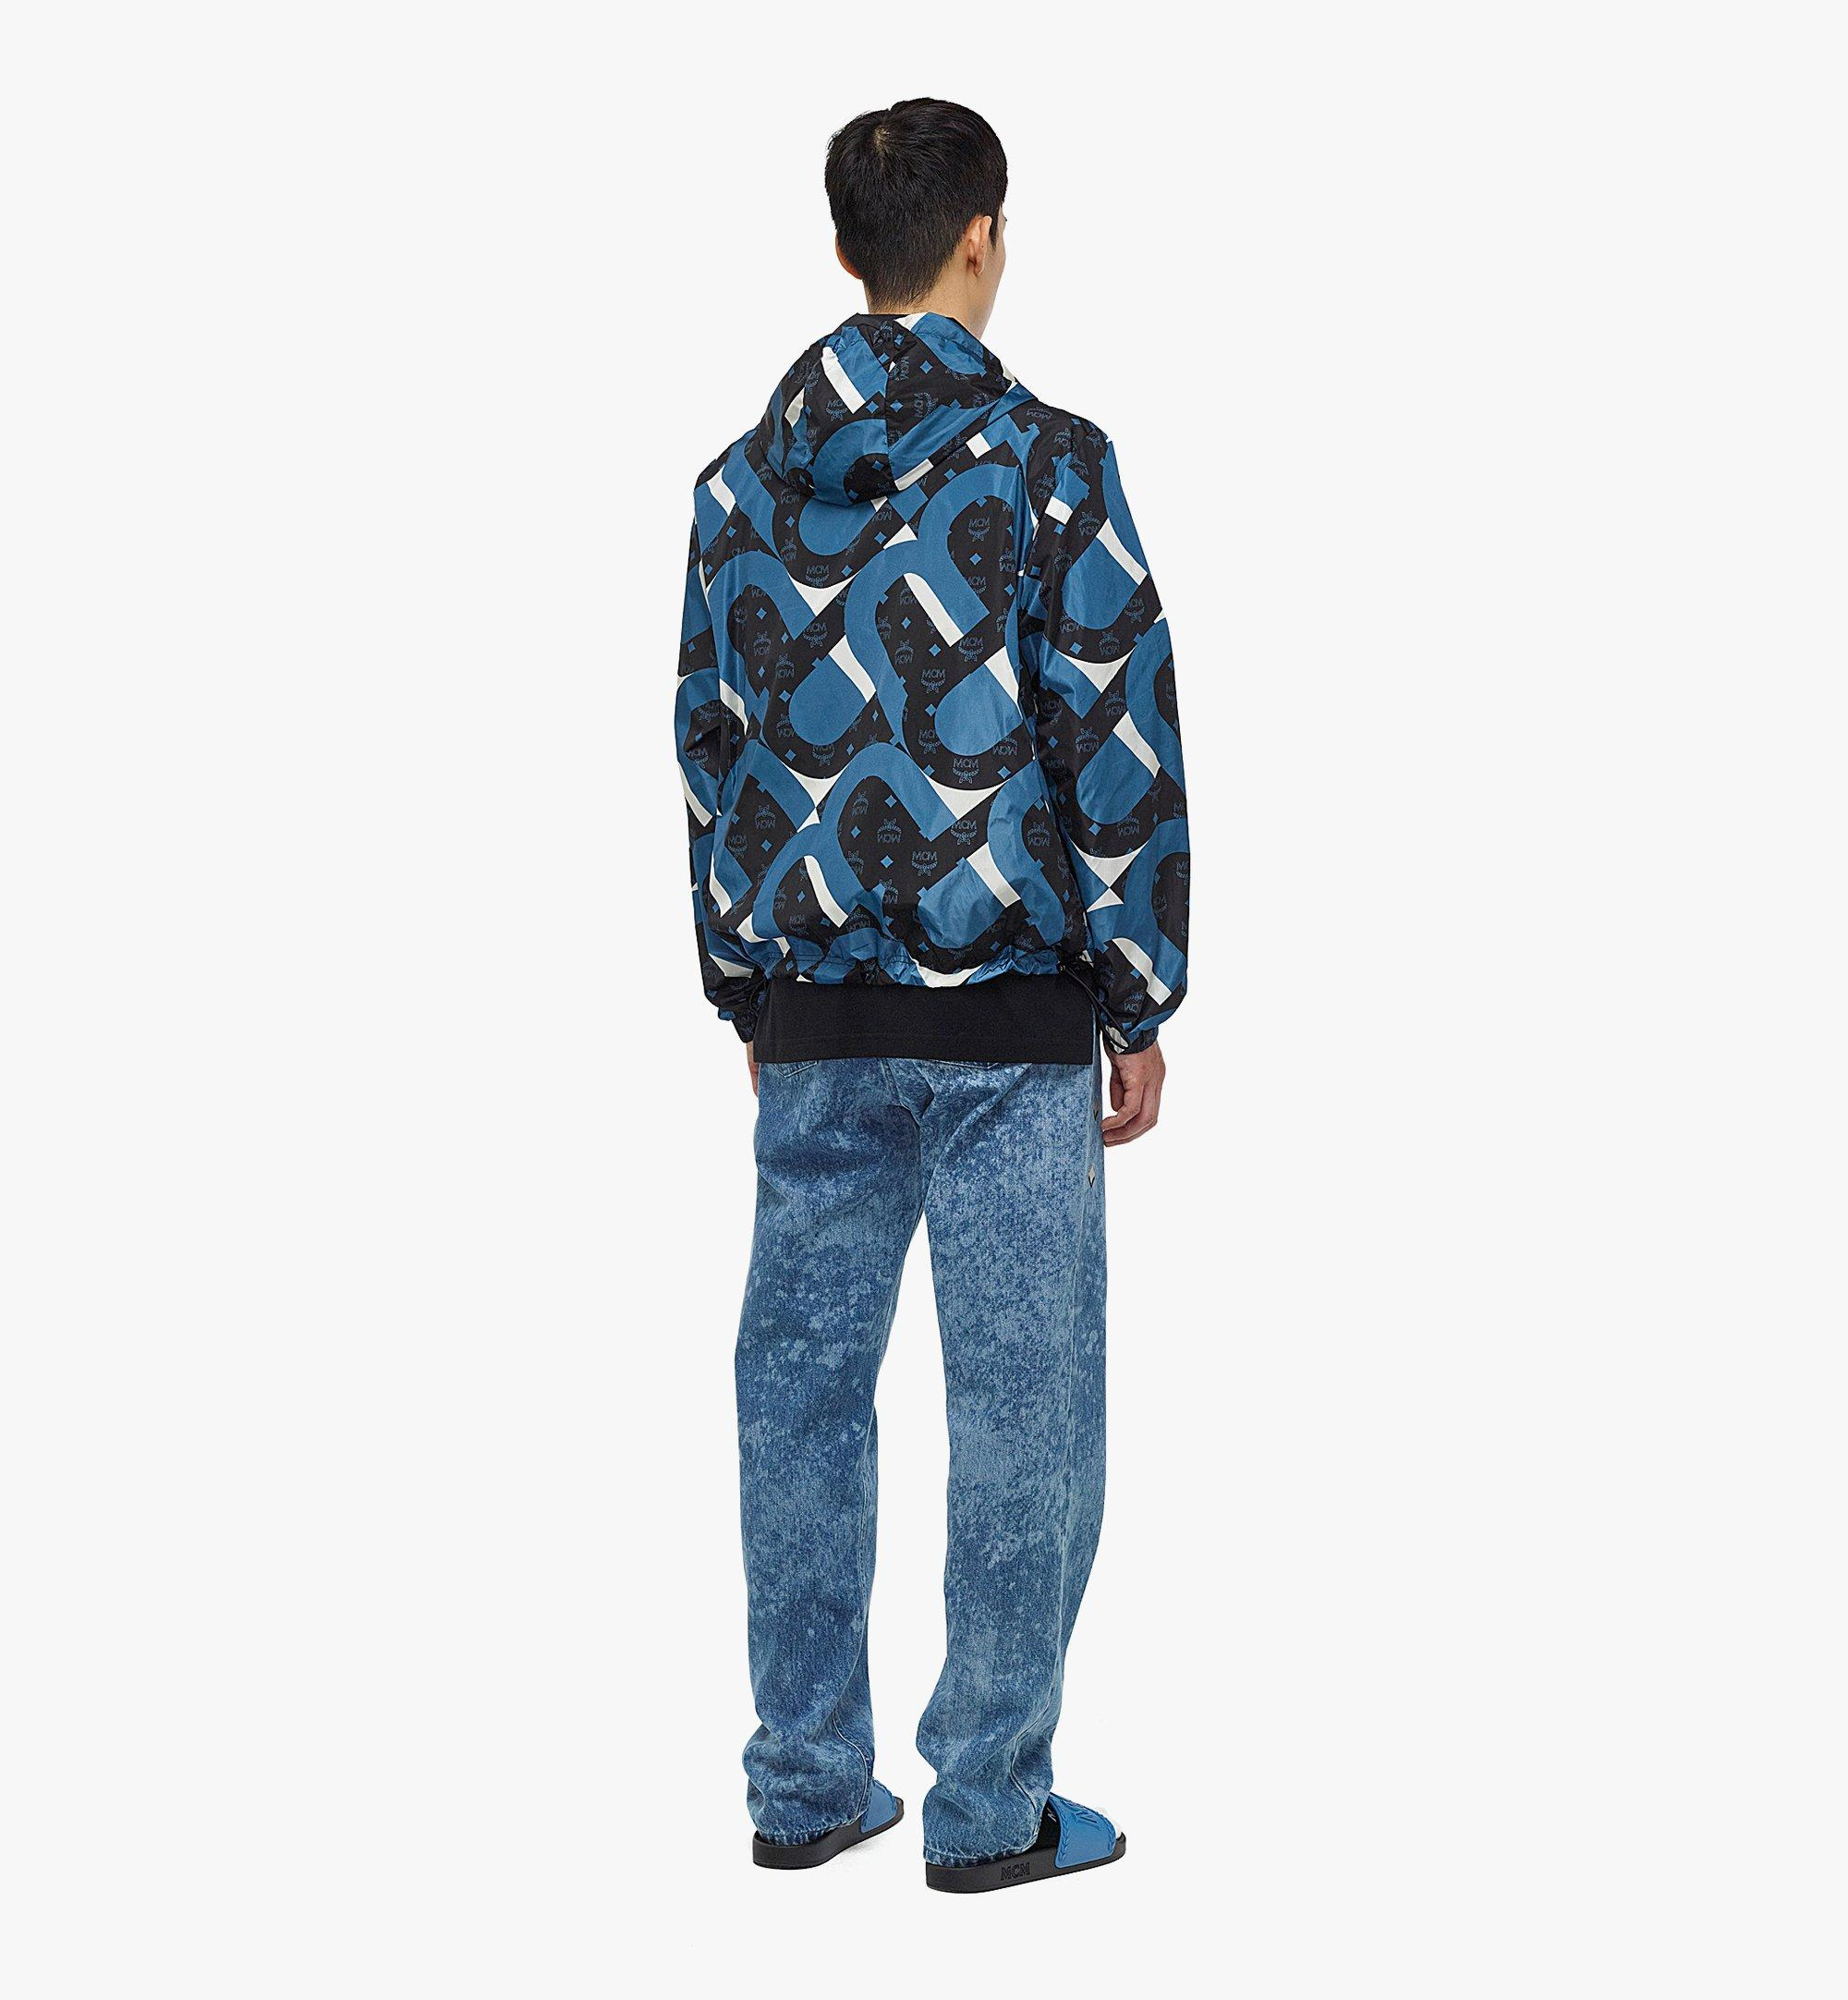 MCM メンズ ウェーブ ヴィセトス プリント ウィンドブレーカー ベルトバッグ付き - ECONYL® Blue MHJBASX01H9046 ほかの角度から見る 2